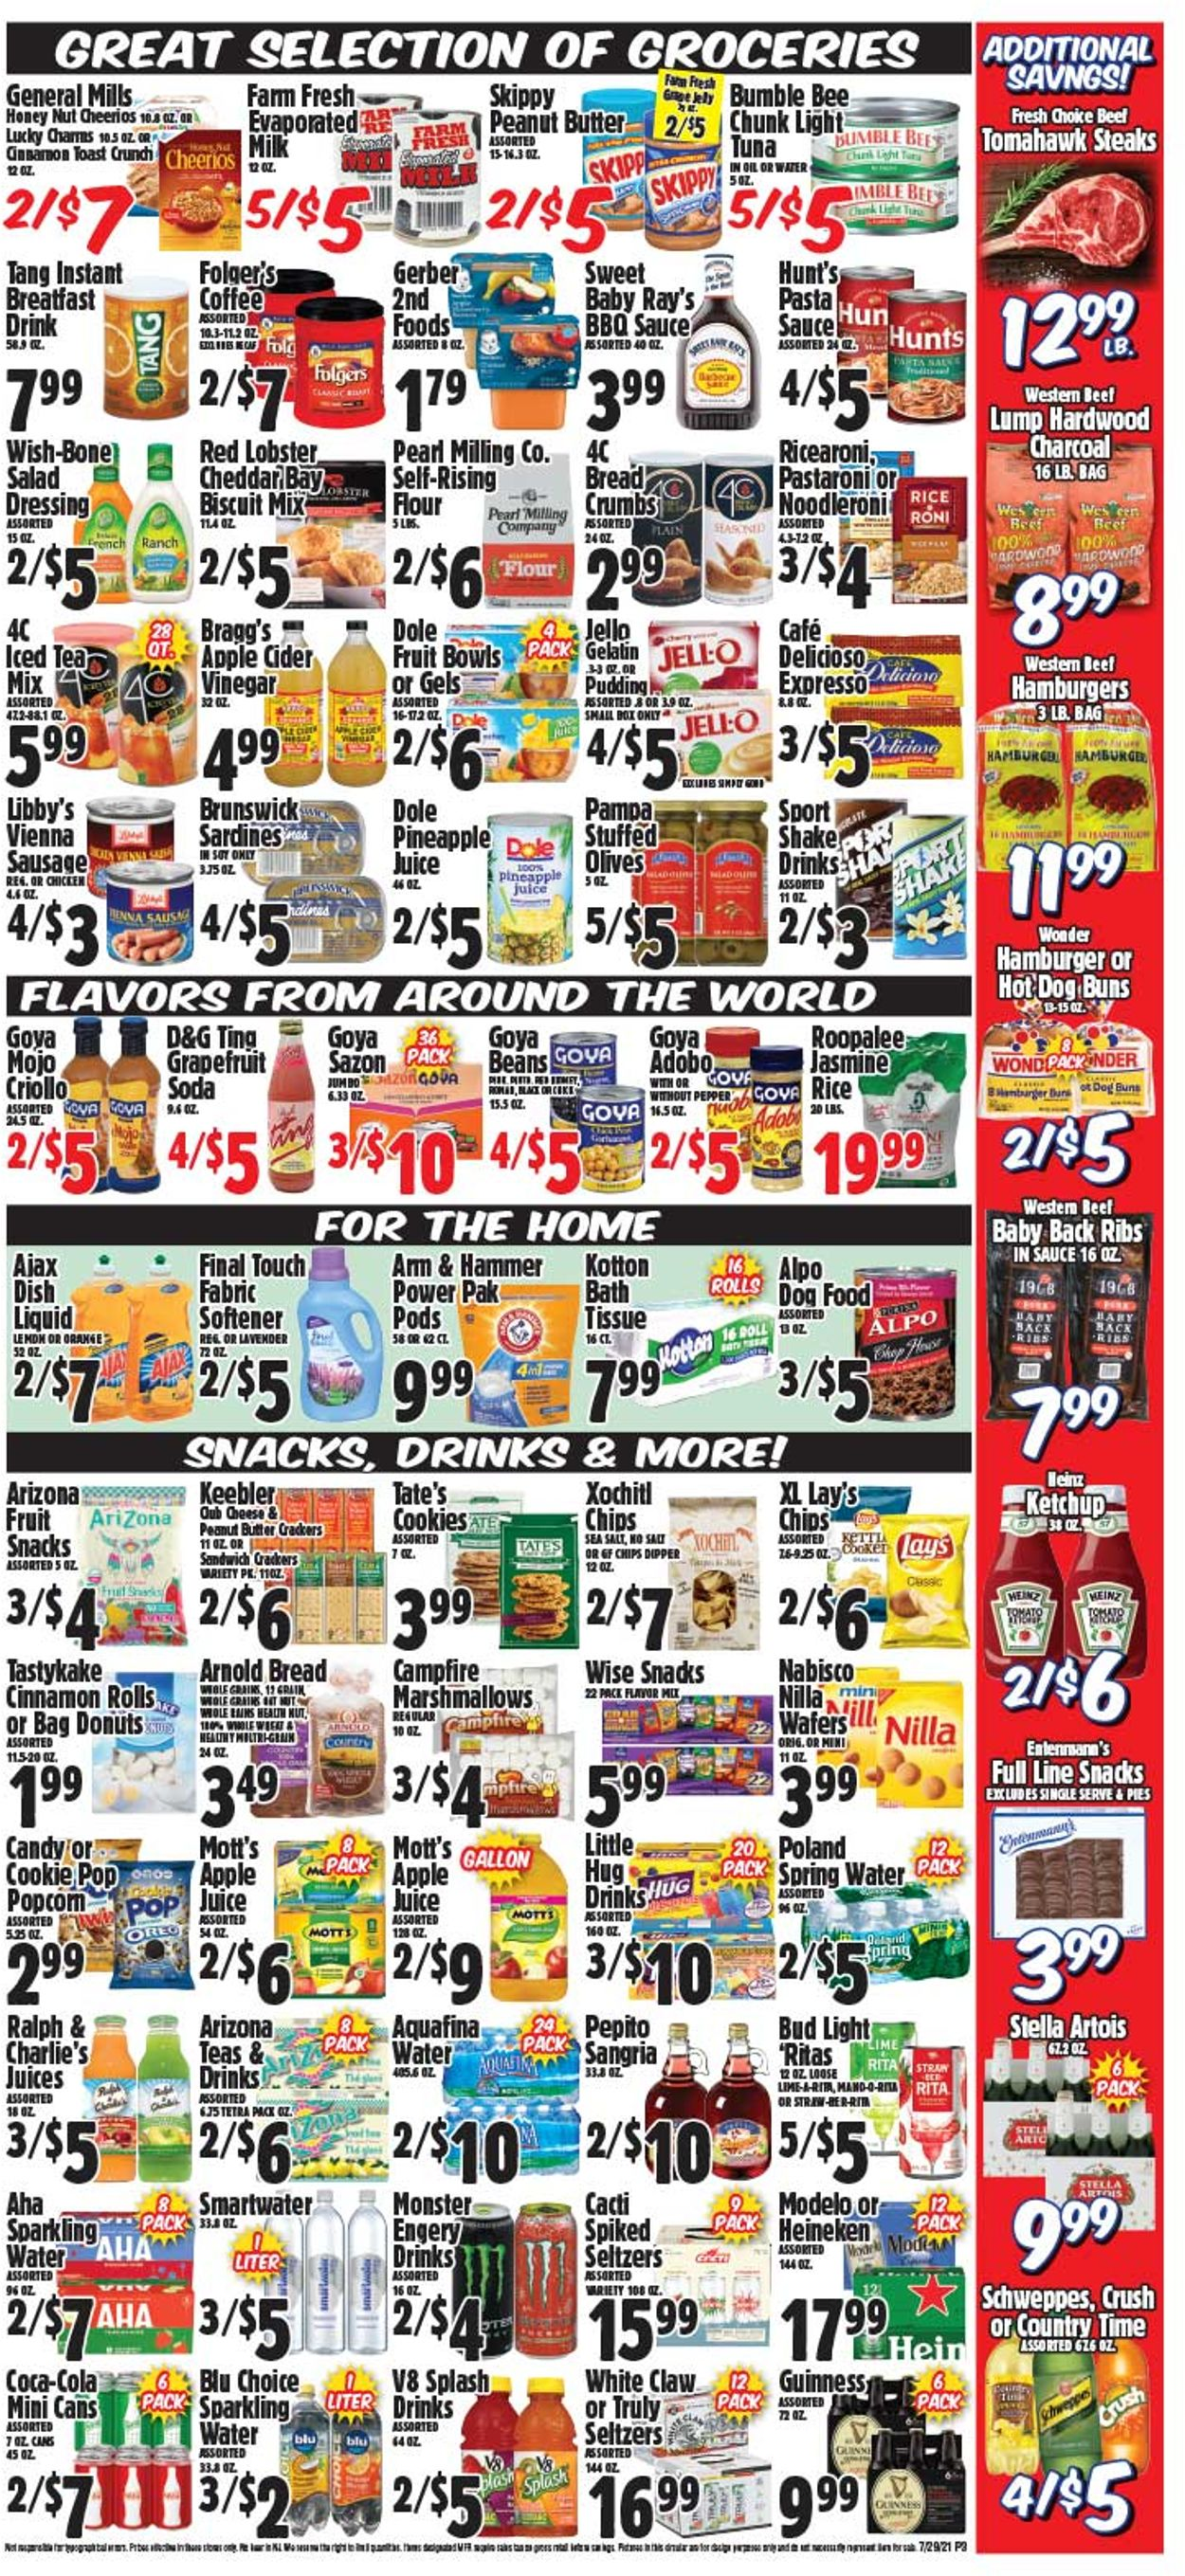 Western Beef Weekly Ad Circular - valid 07/29-08/04/2021 (Page 4)